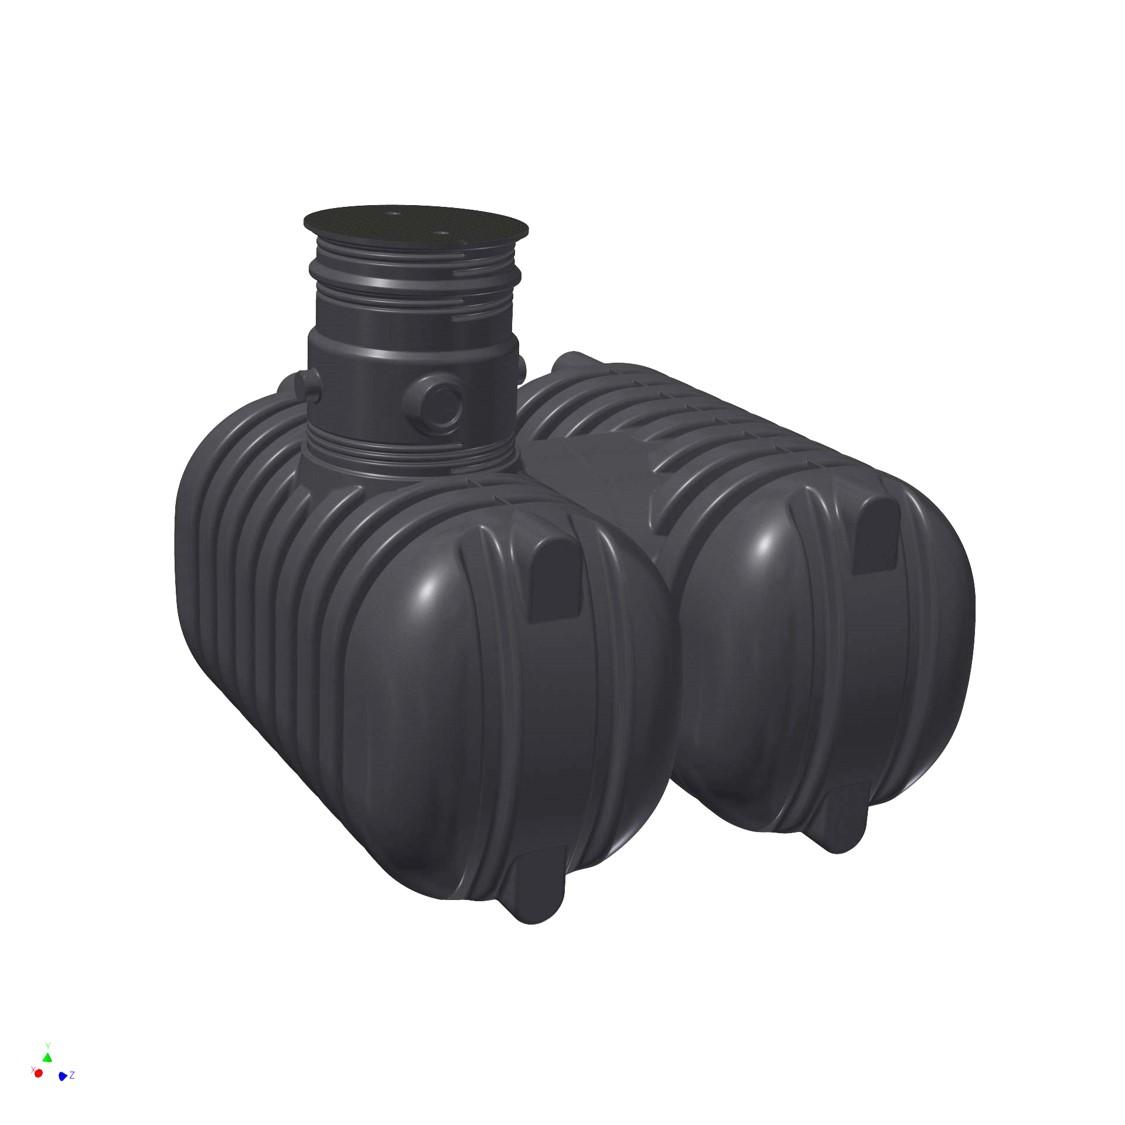 regenwasser tank zisterne erdtank speicher bs starter. Black Bedroom Furniture Sets. Home Design Ideas